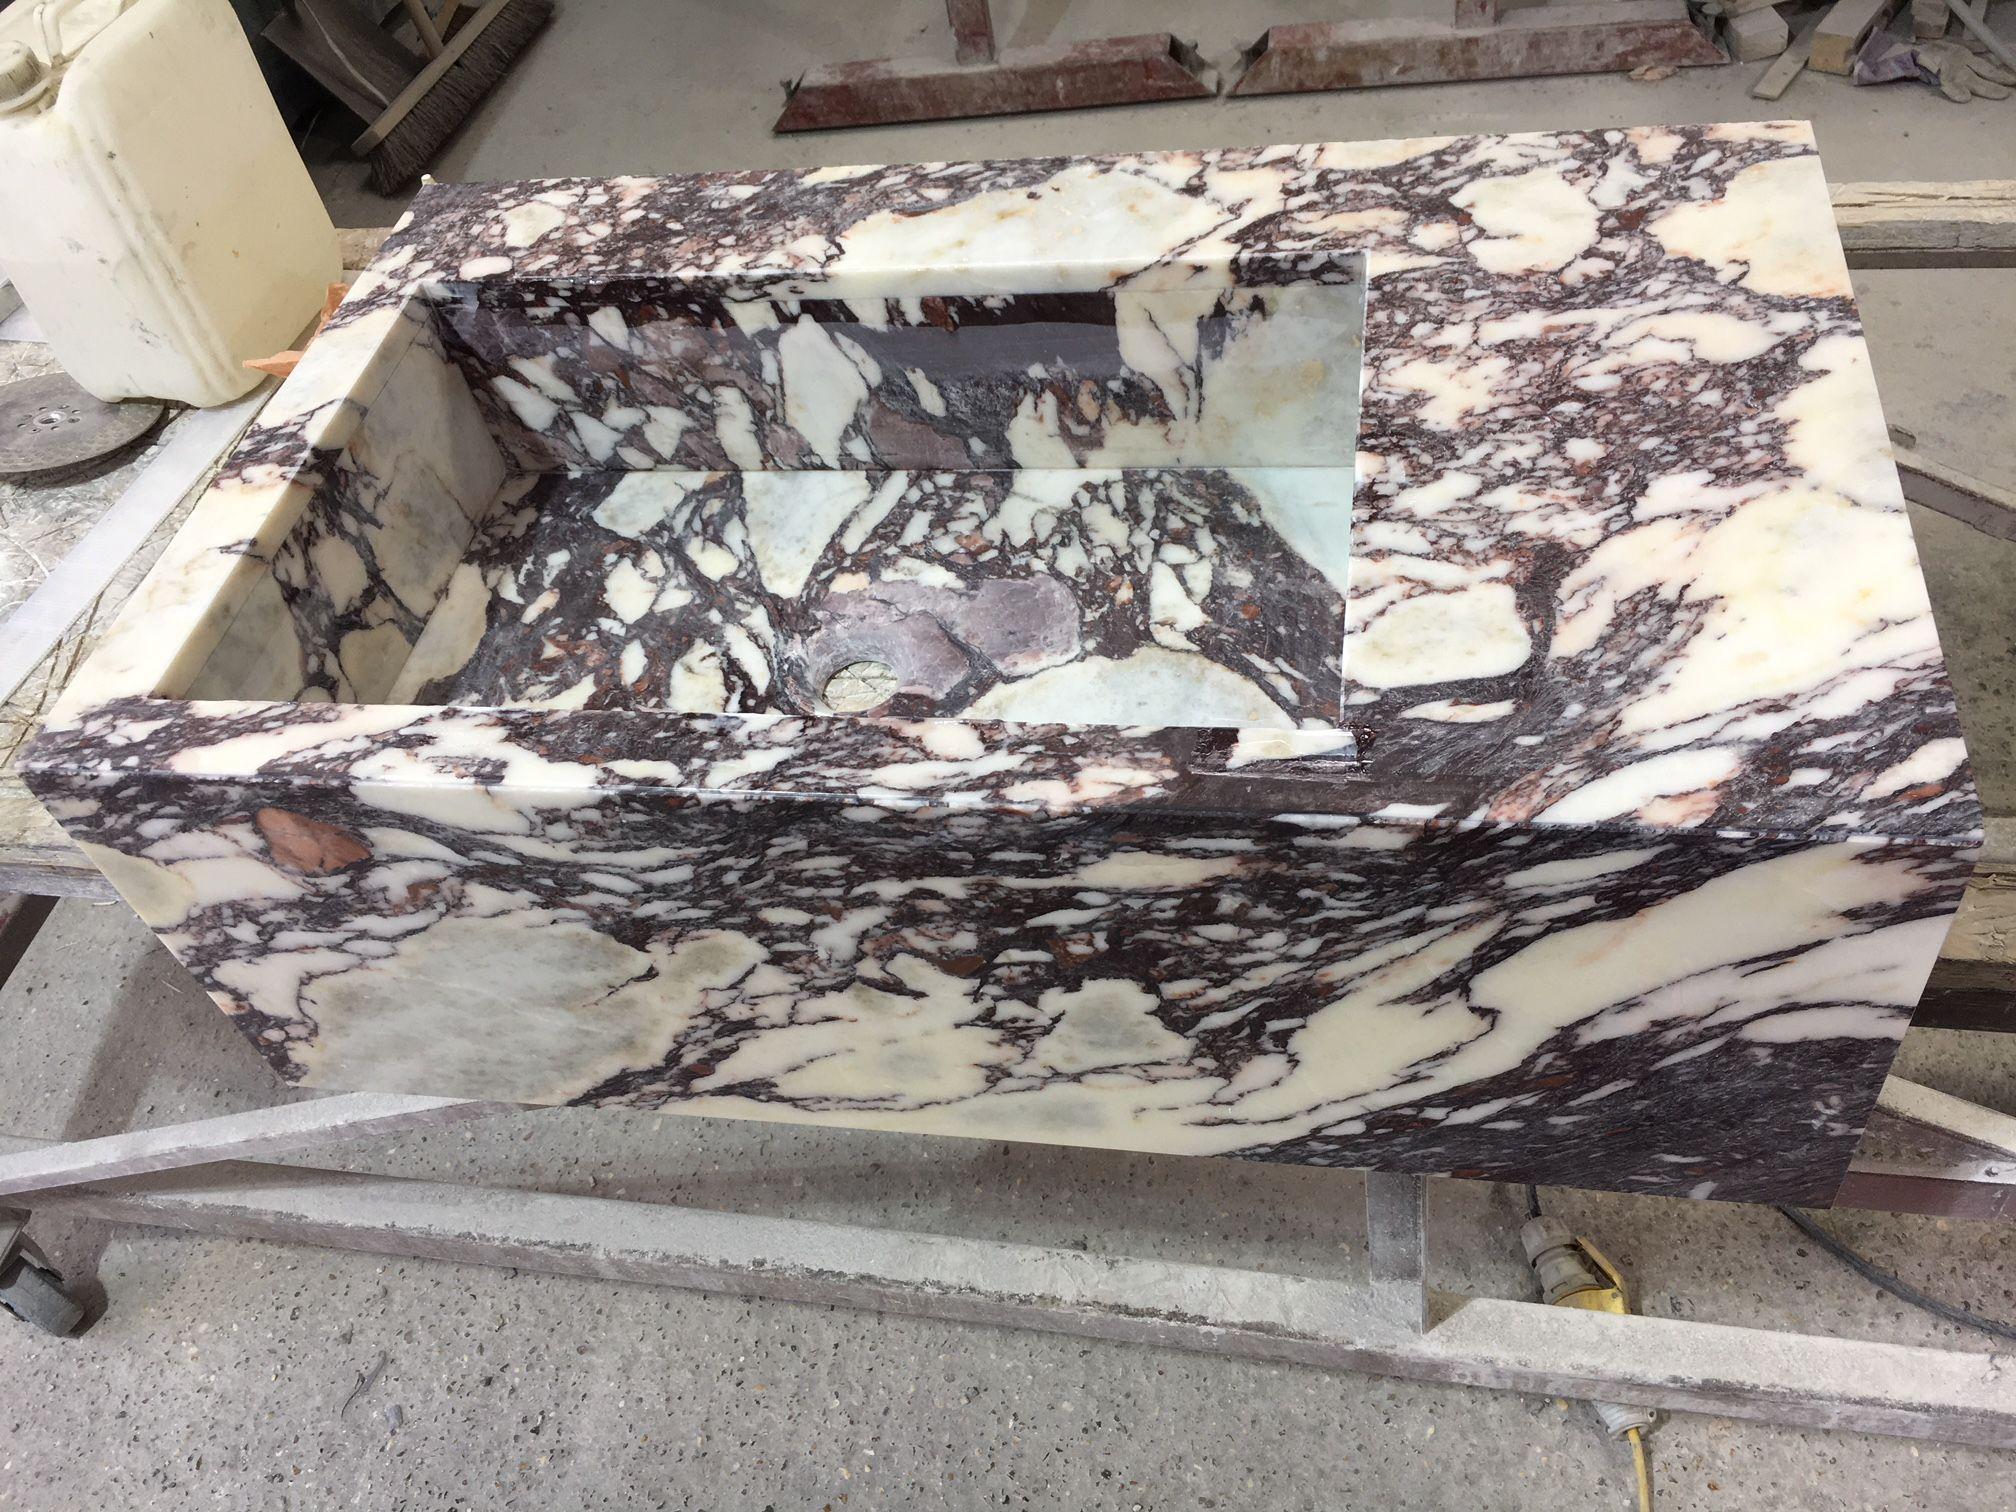 Making A Basin In Calacatta Viola Polished Marble Www Stoneofdestinydesign Co Uk Stone Of Destiny Unit 1 Lines Farm Estate Pa Stone Stone Sink Calacatta